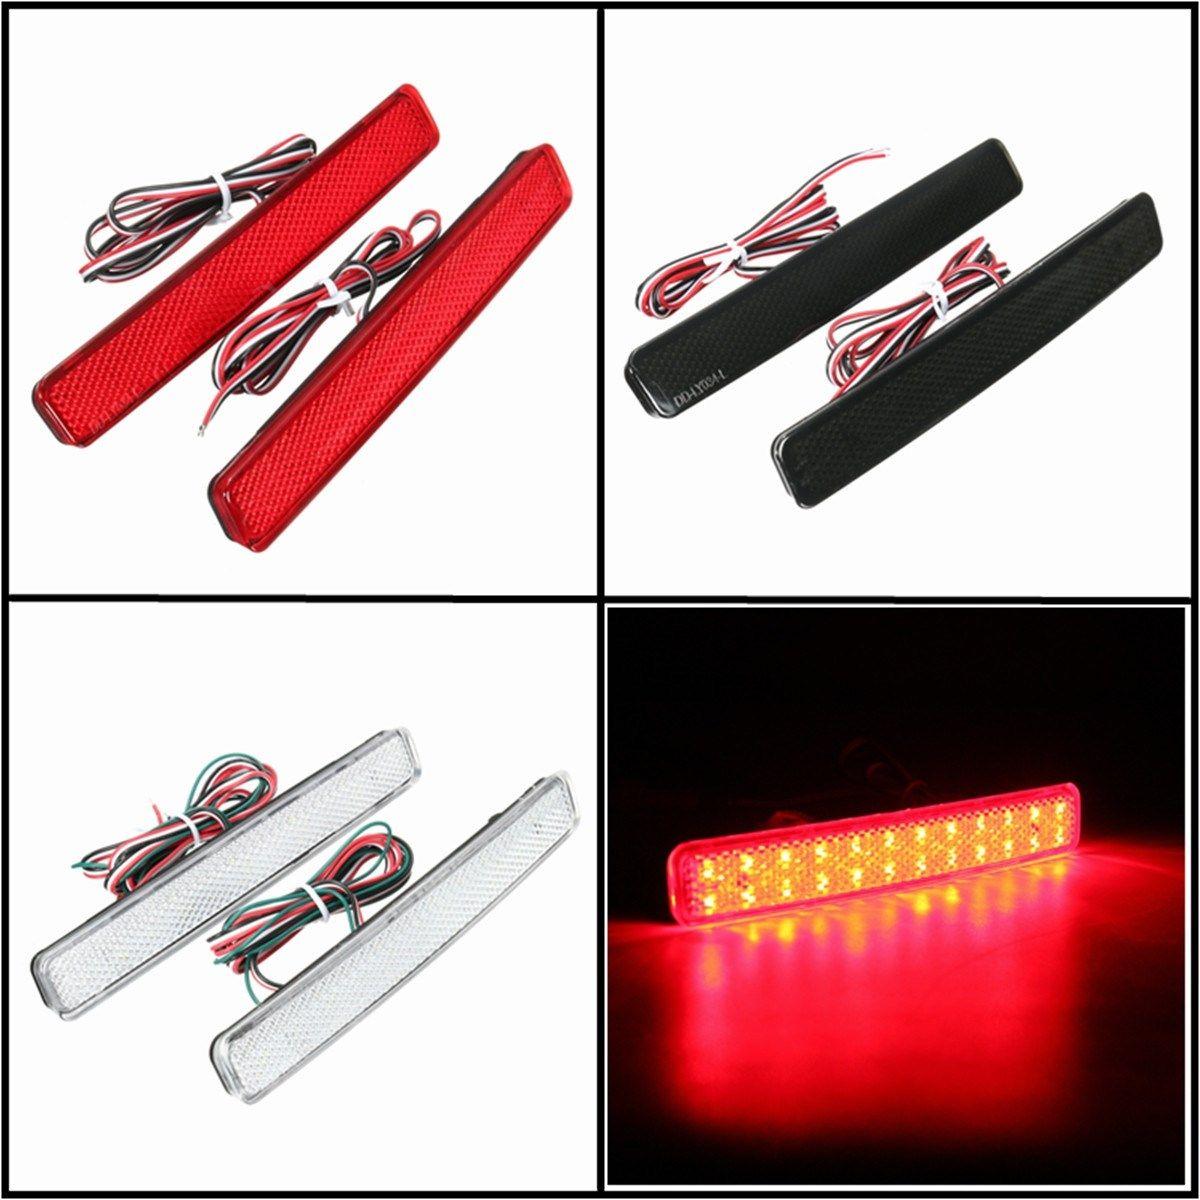 2x 24 LED Auto Rear Reflectors Bumper Tail Fog Lamp Brake Stop Night Running Lights Driving Reverse Light For VW/T5 Transporter